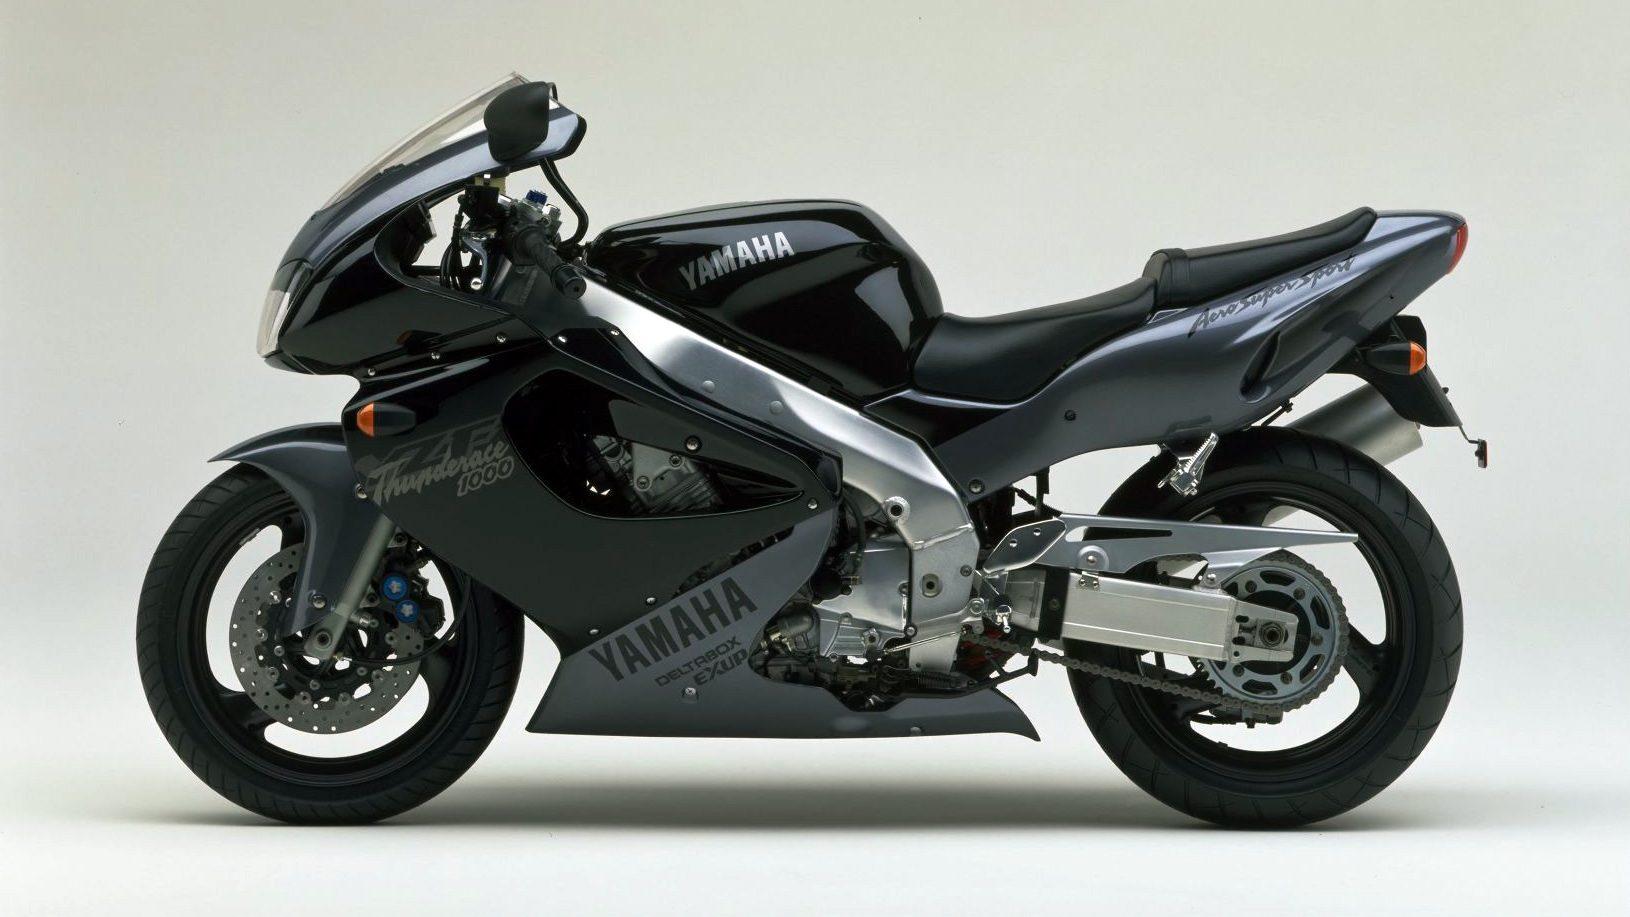 Yamaha YZF 1000R Thunderace 4